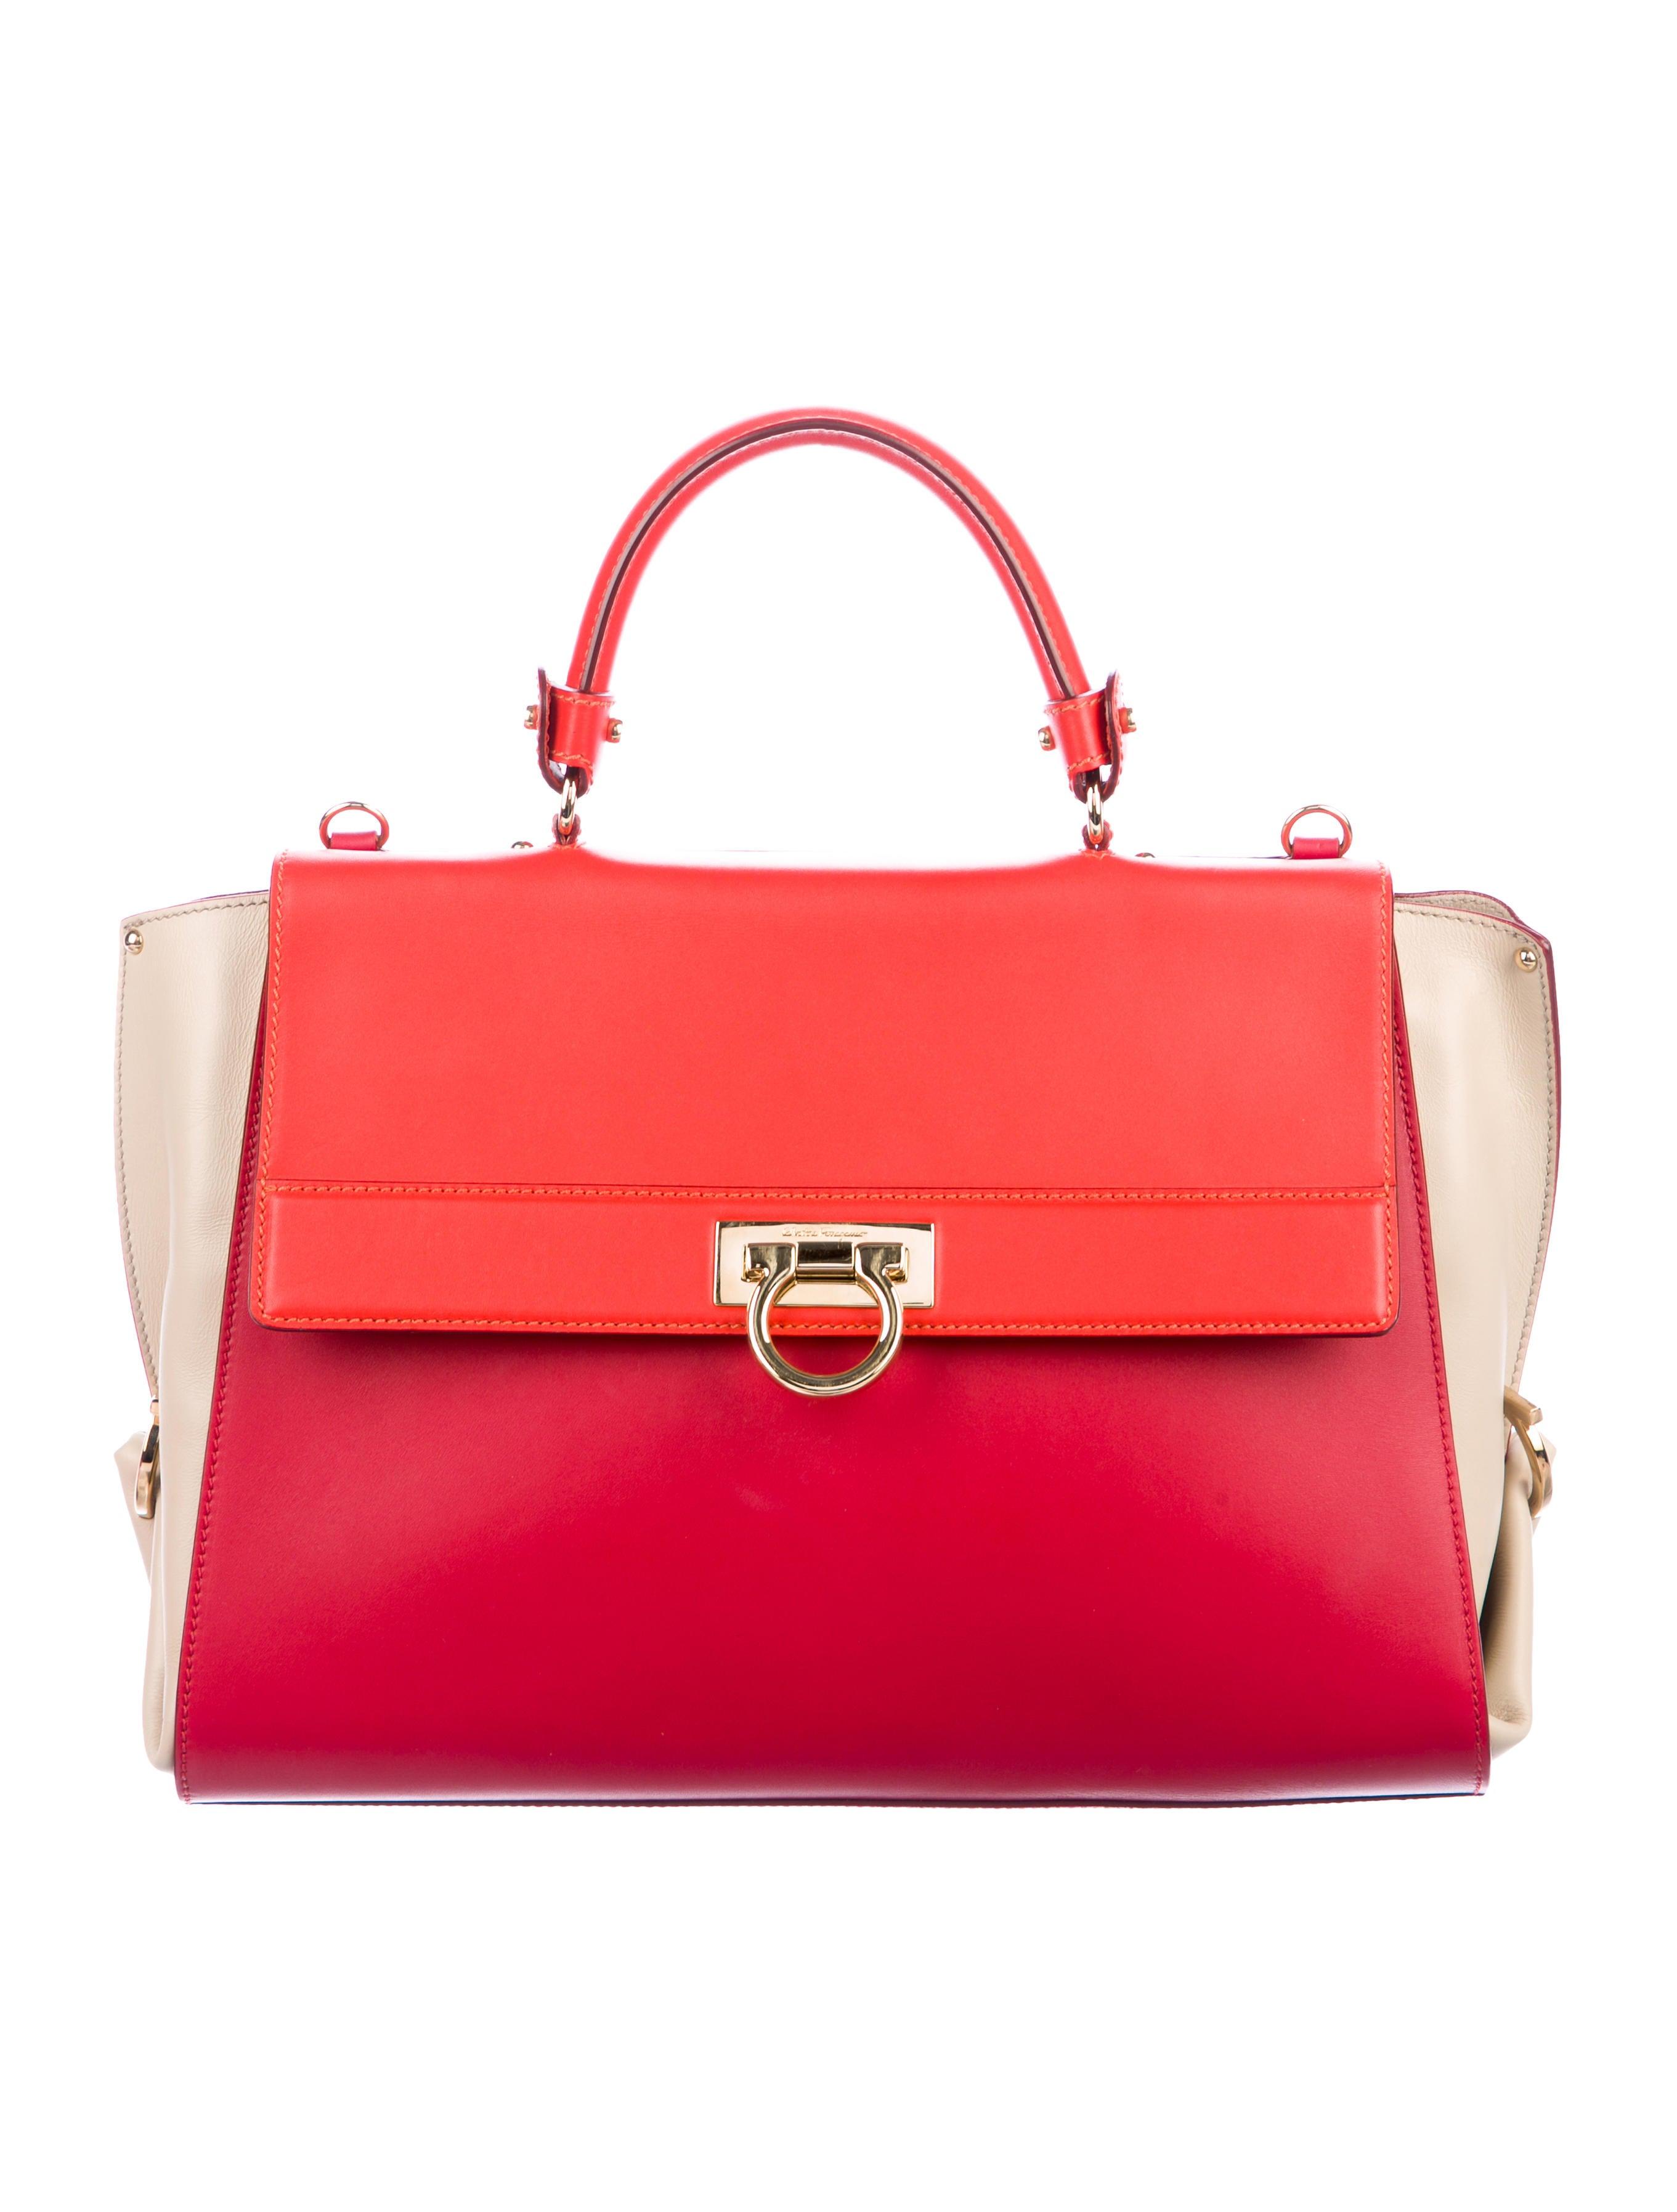 088f8c2de4 Salvatore Ferragamo Tricolor Sofia Satchel - Handbags - SAL92452 ...